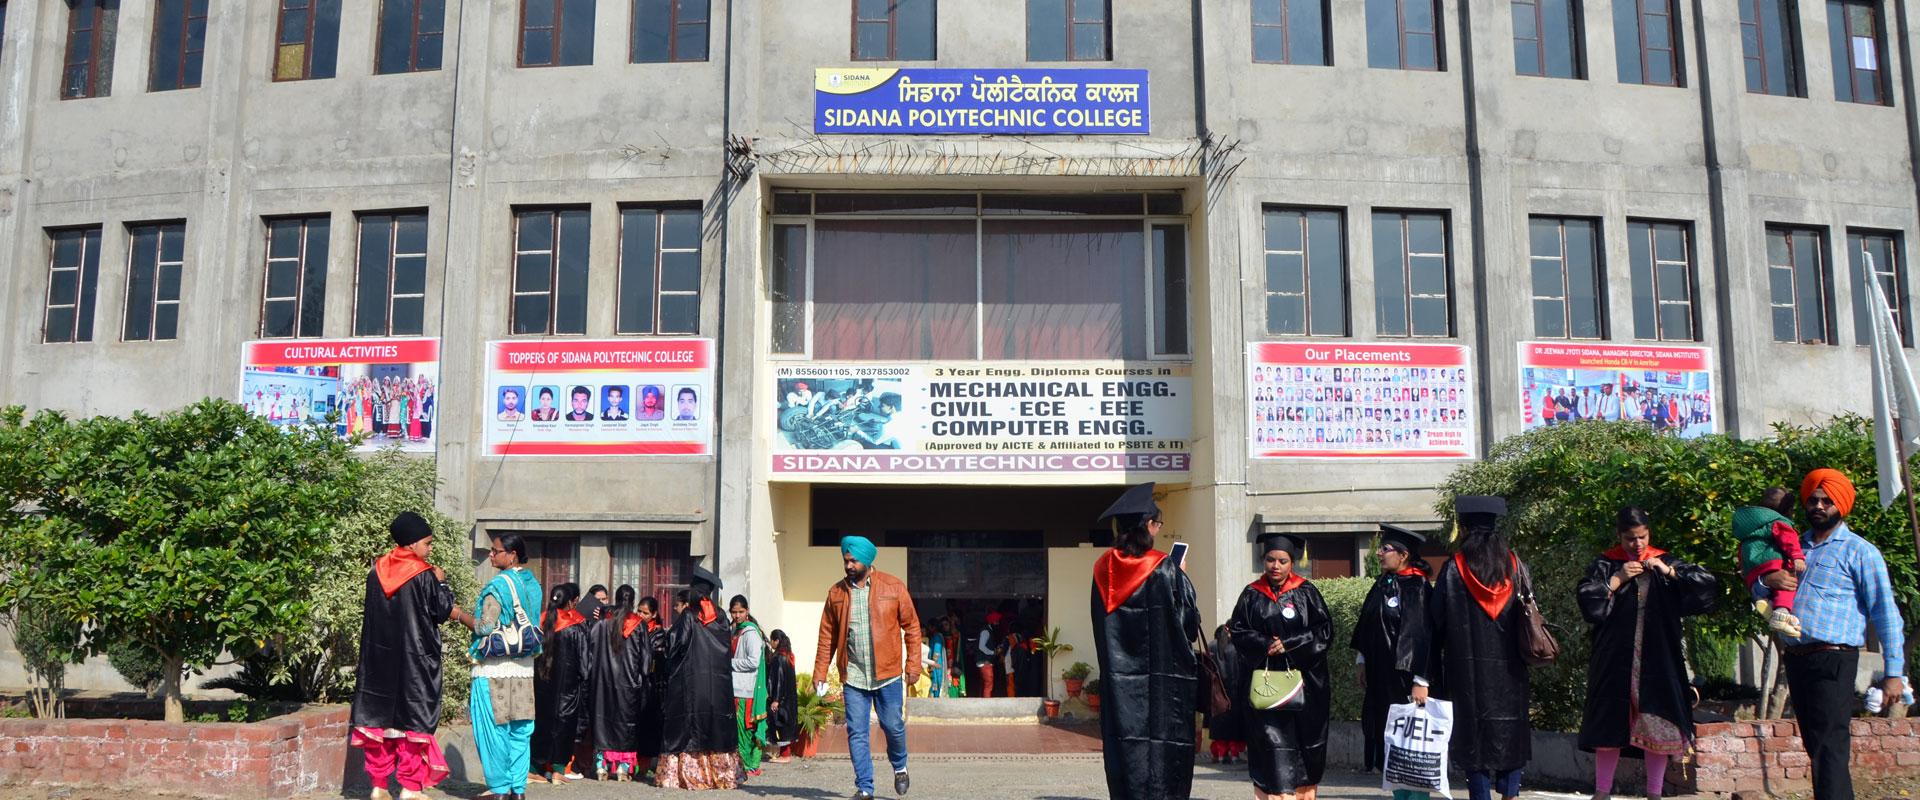 Sidana Polytechnic College